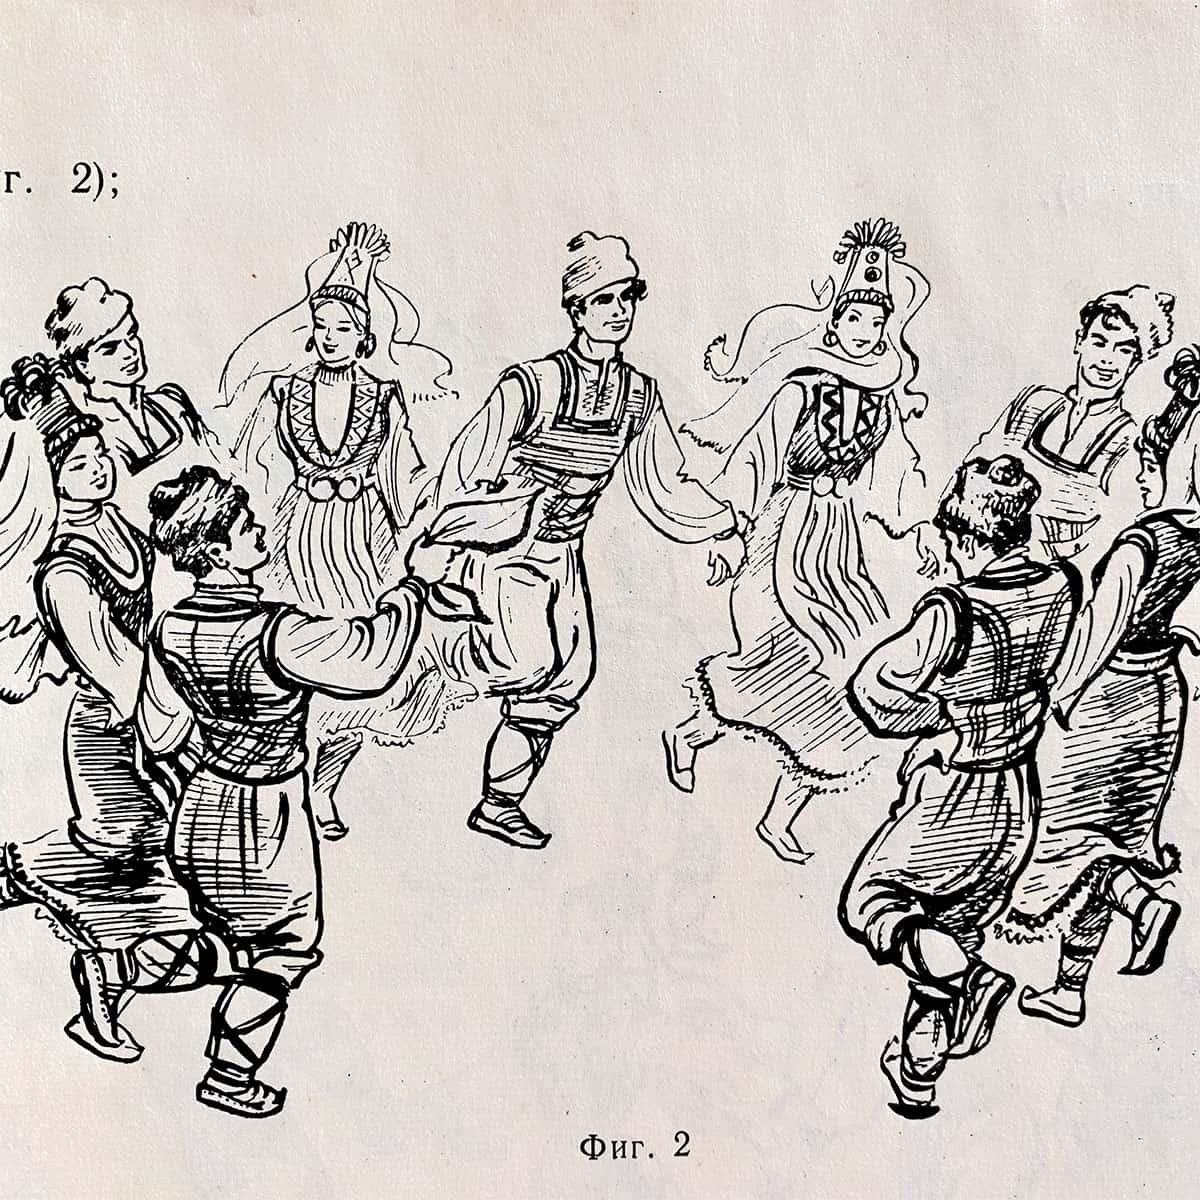 танцуване на Ганкино хоро - фигура 2